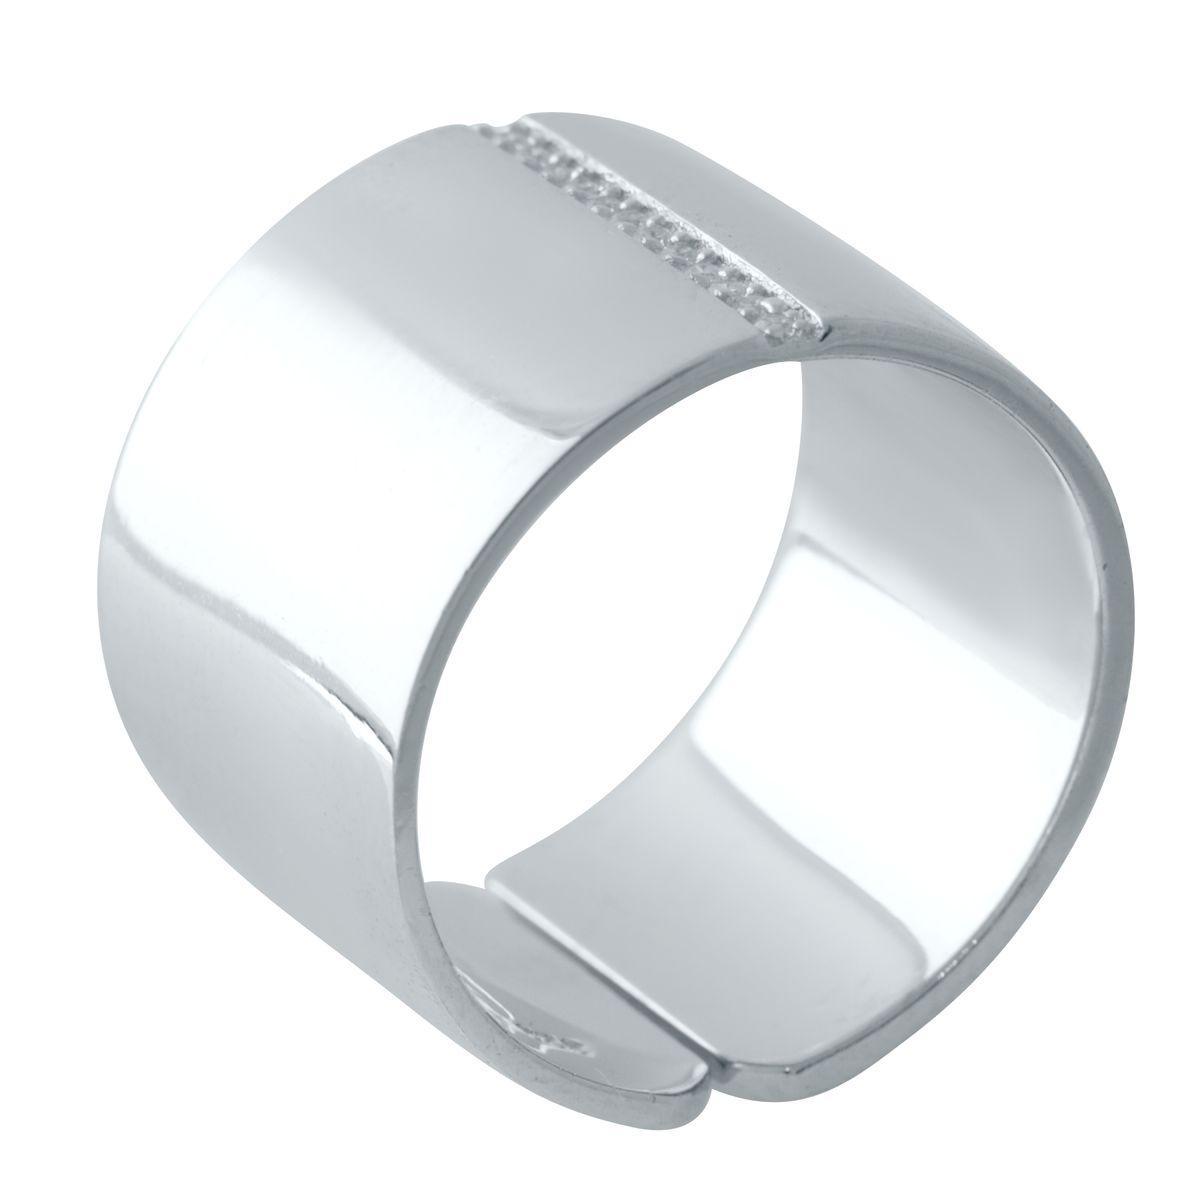 Серебряное кольцо DreamJewelry с фианитами (2029502) 17 размер